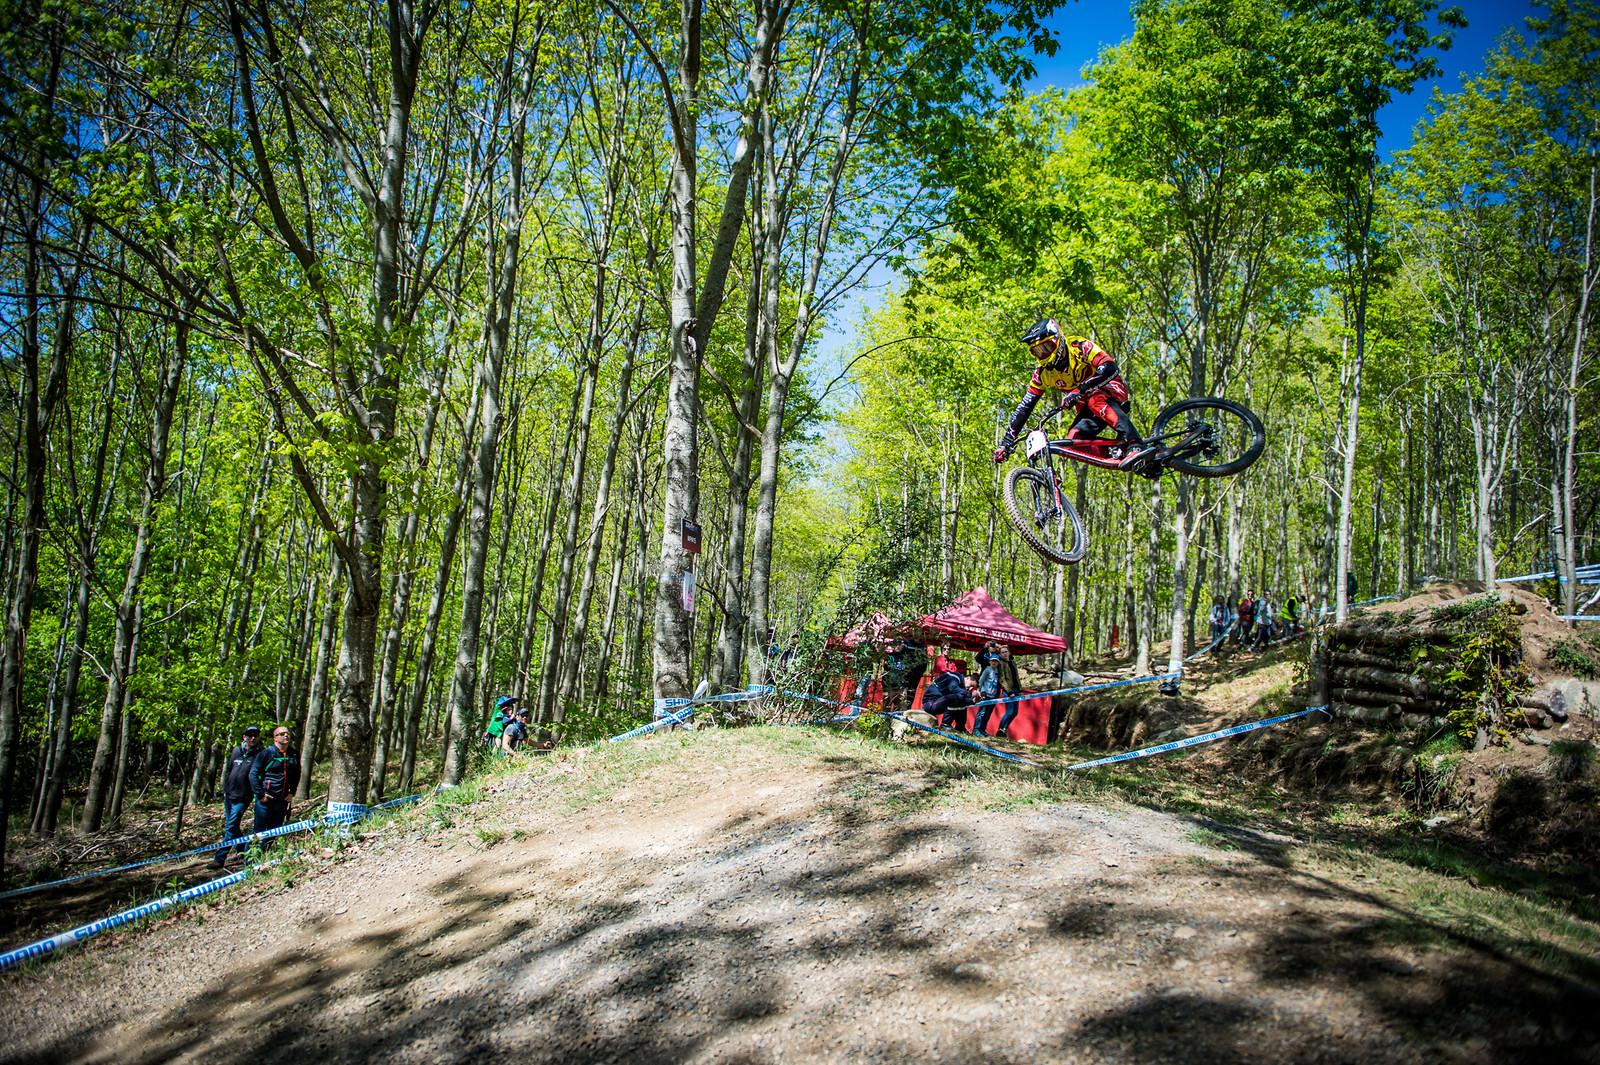 Alexandre Fayolle - iceman2058 - Mountain Biking Pictures - Vital MTB